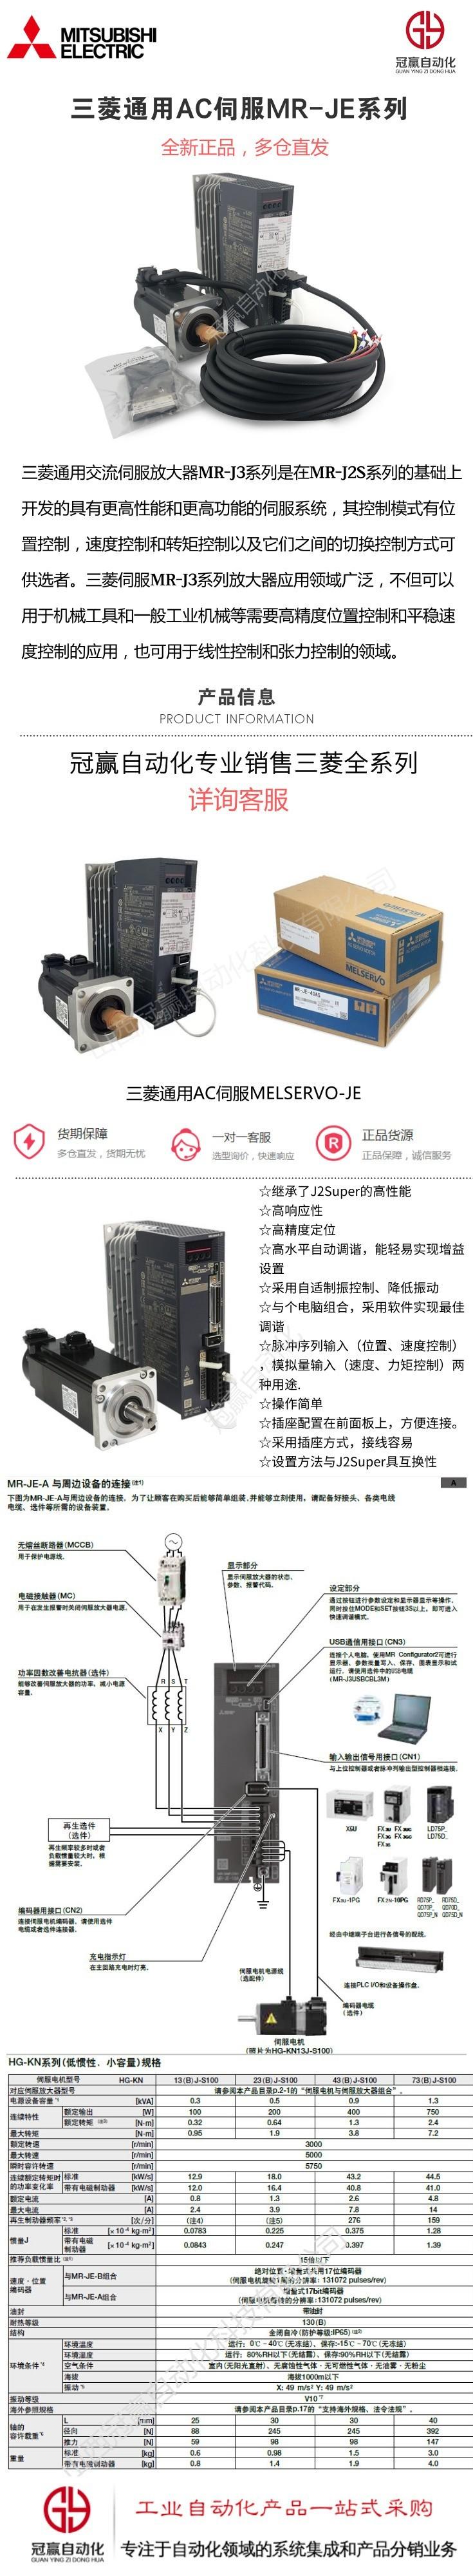 三菱伺服电机HG-KN43J-S100+MR-JE-40A 100A 70A 10A 23/102J/73J